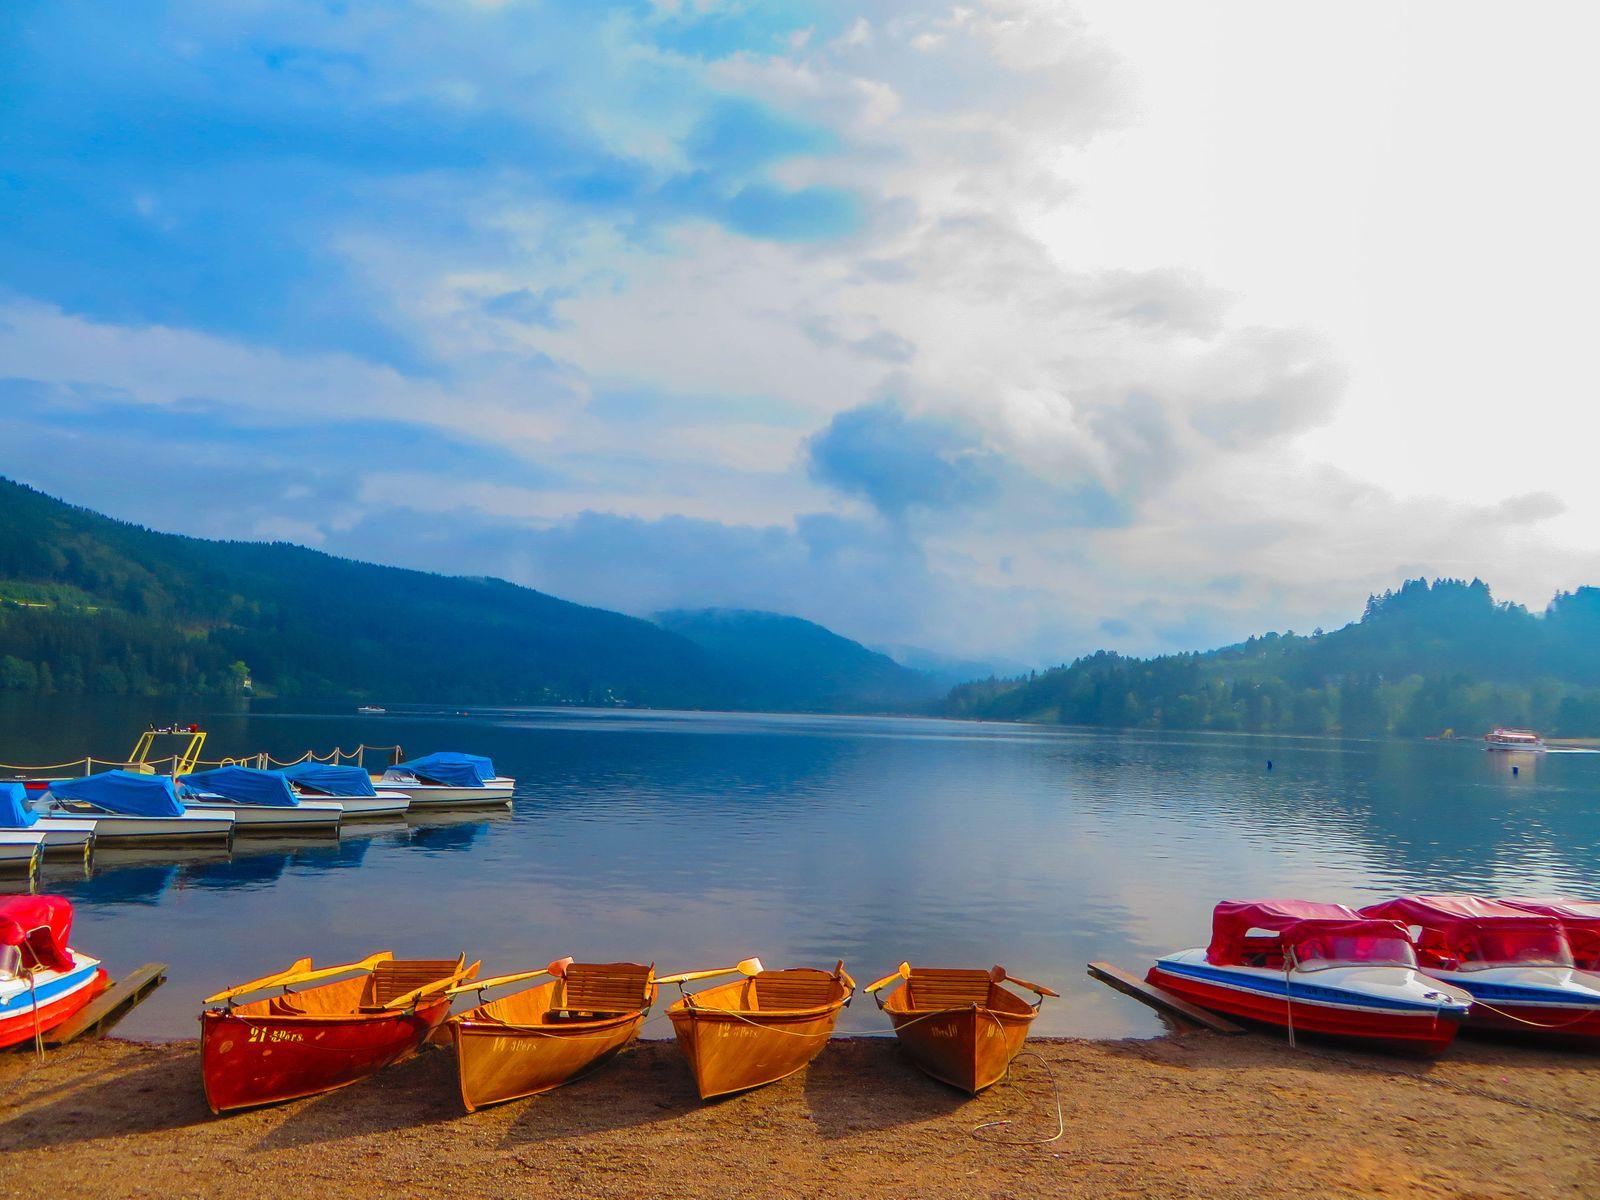 Morning on Lake Titisee Germany